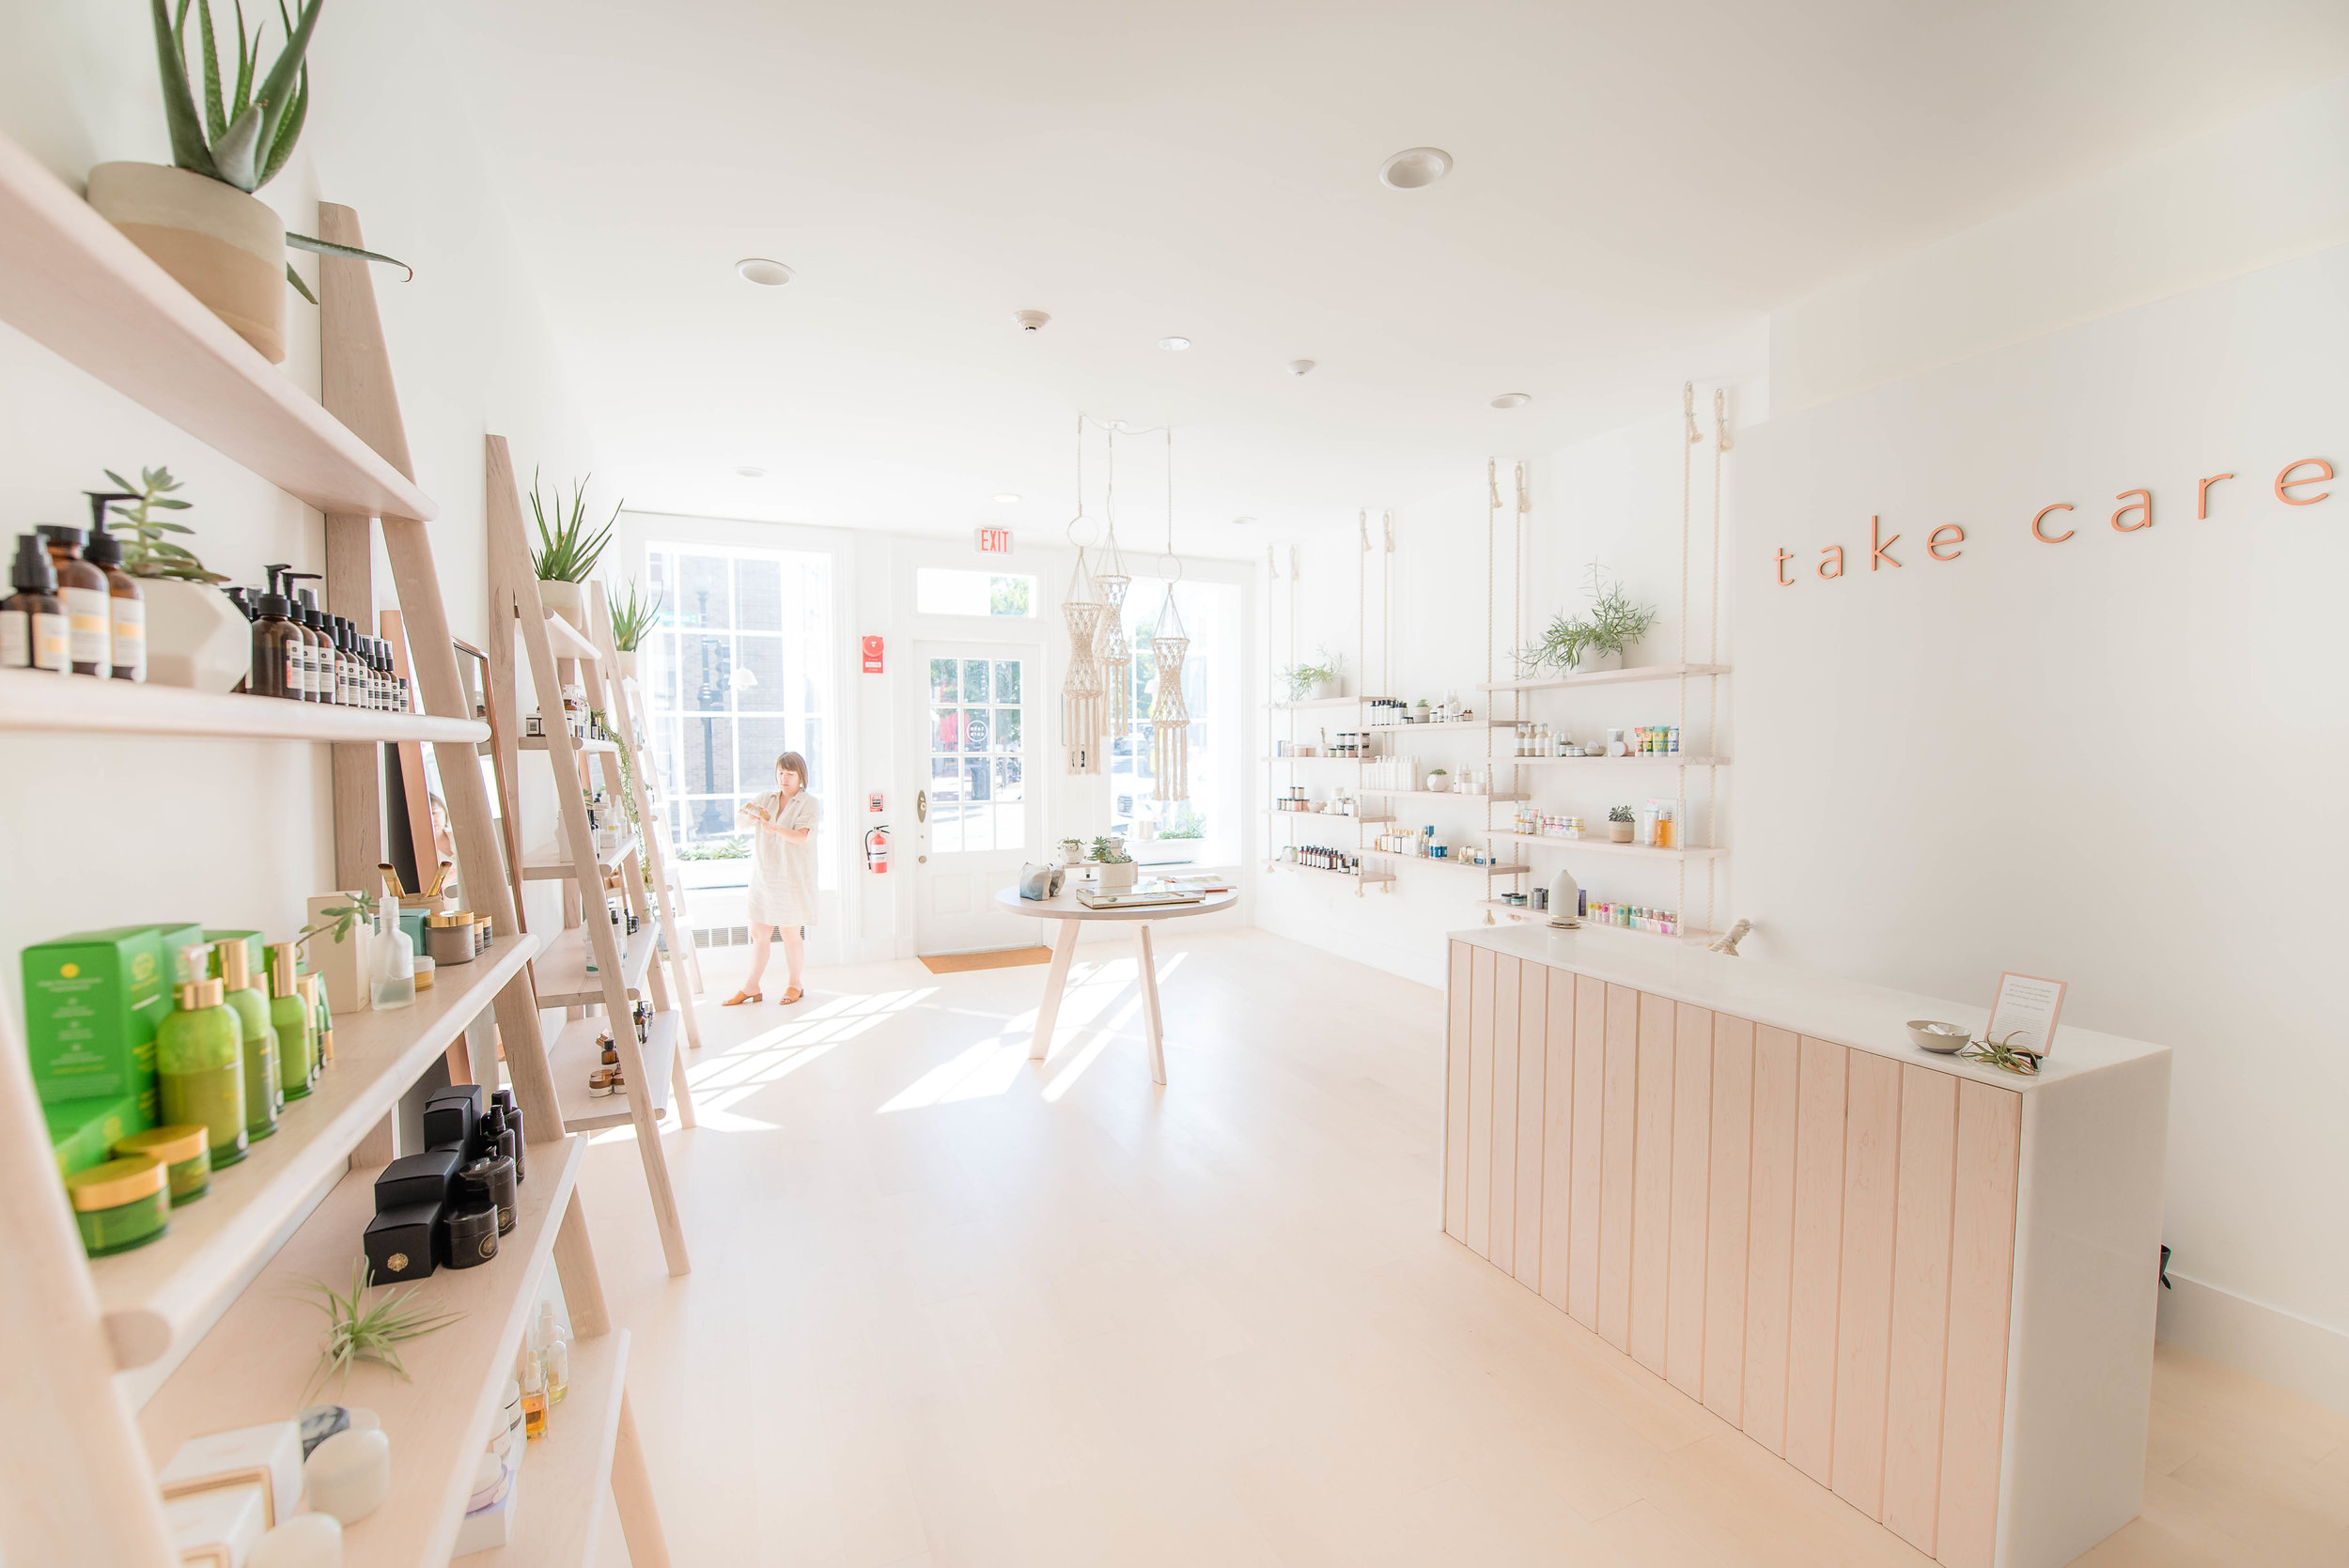 Erin-Fabio-Photography-Take-Care-August-Store-2018-5.jpg